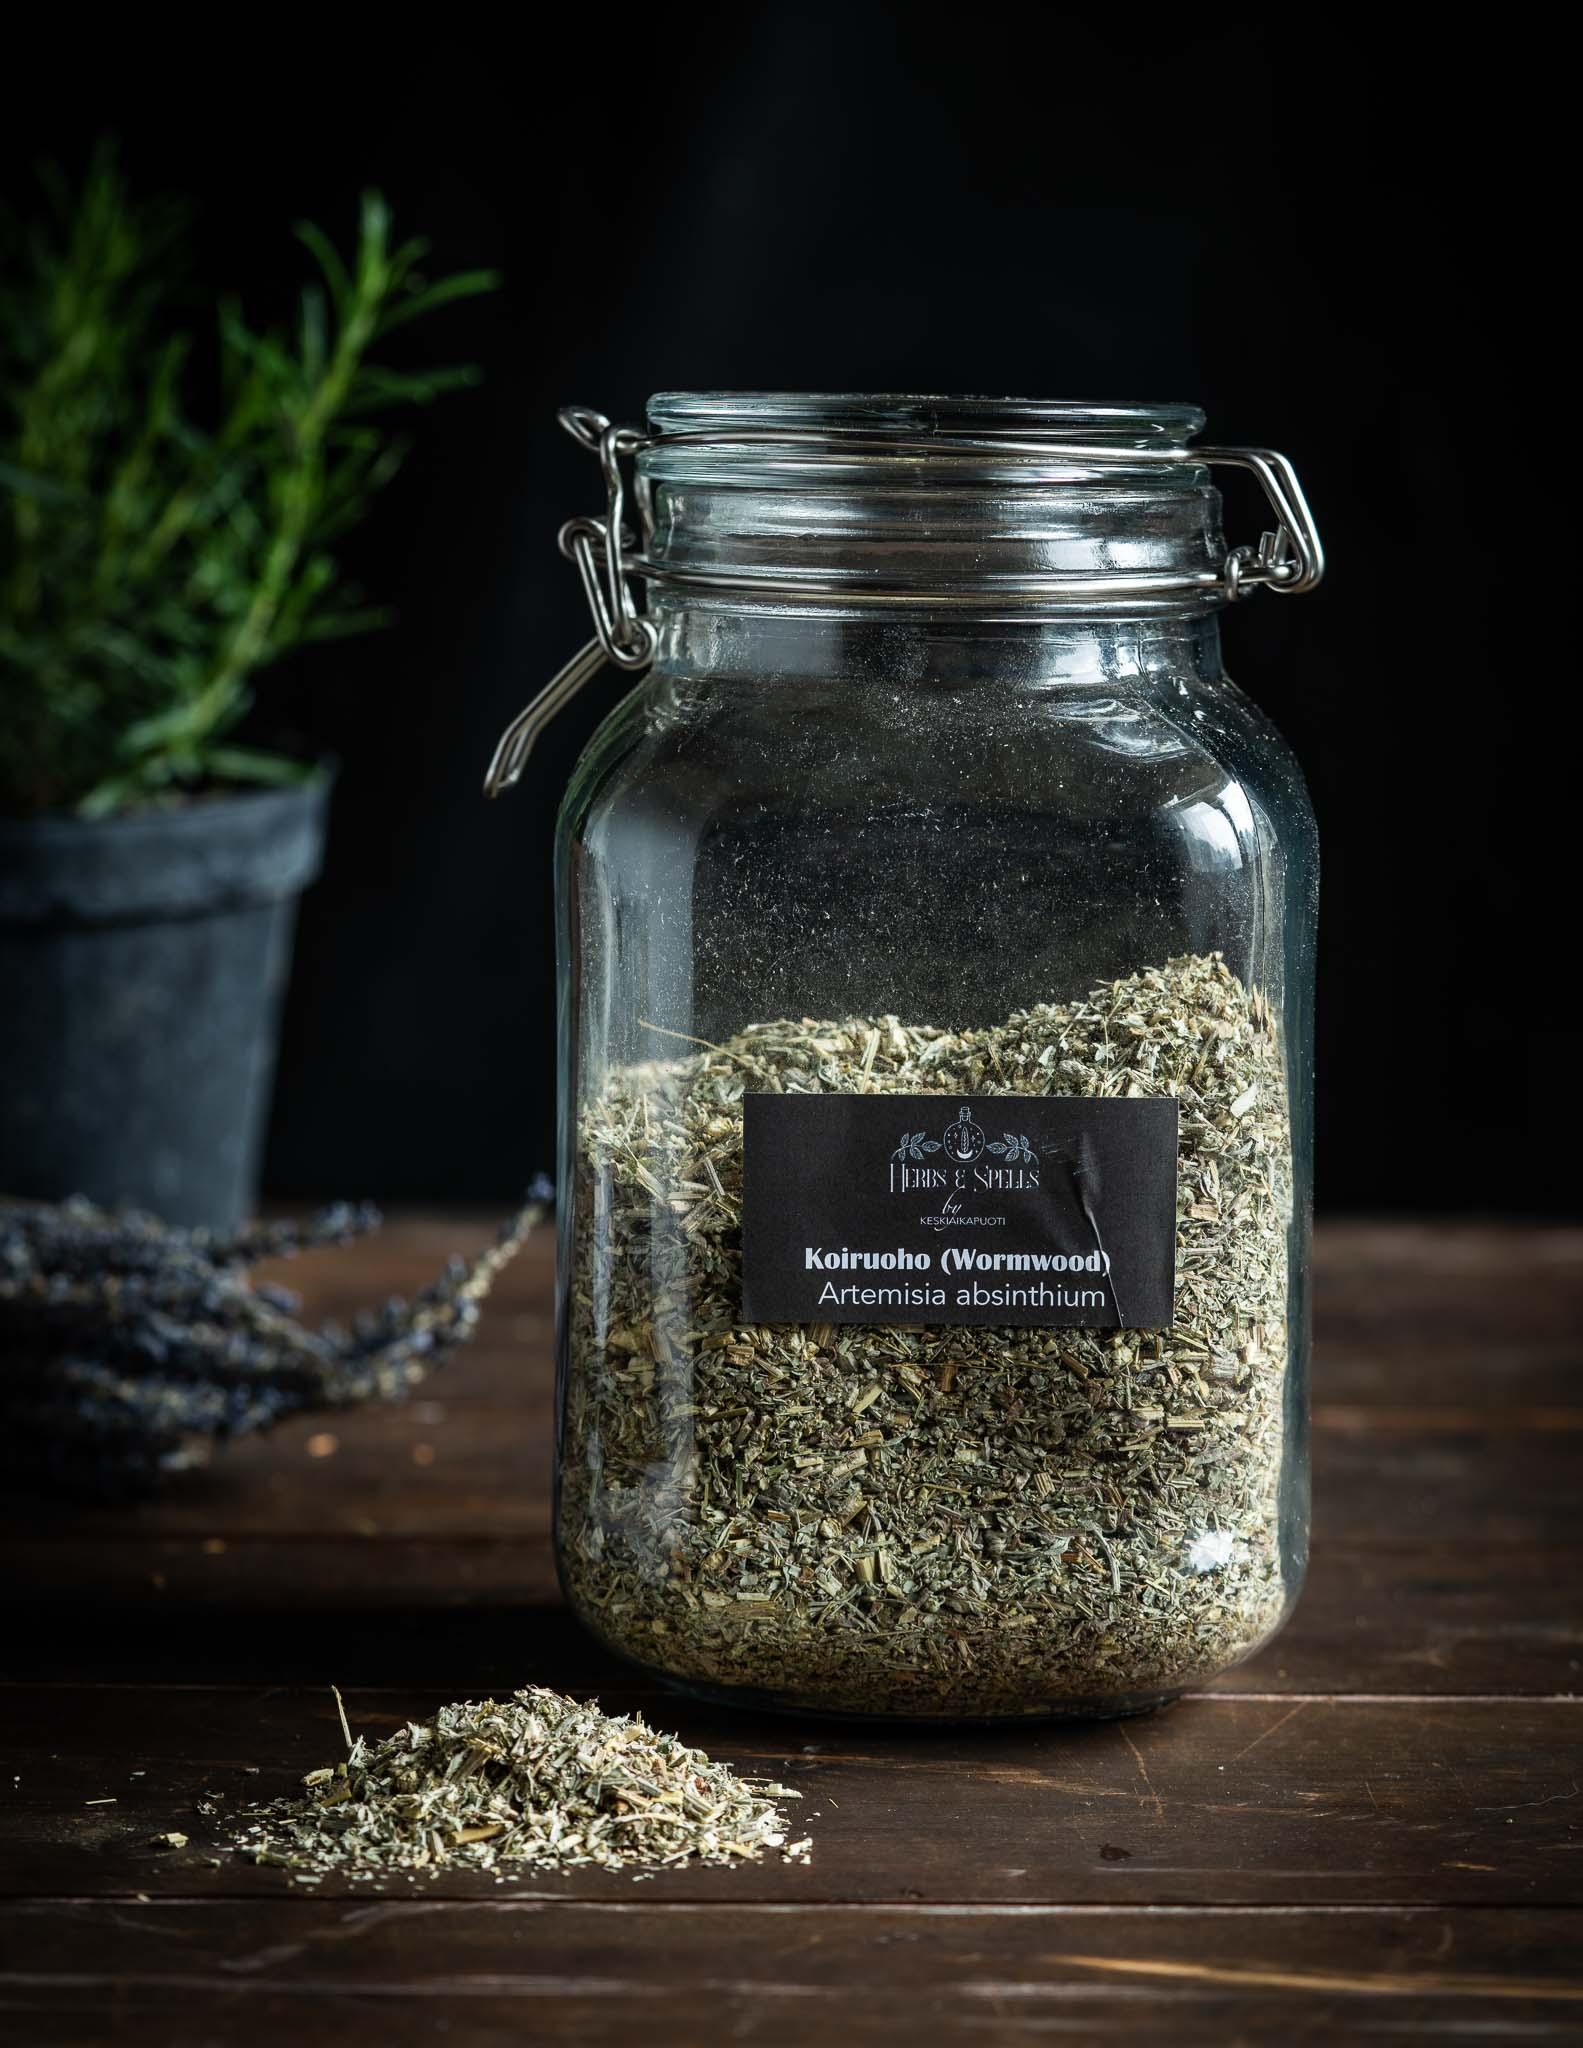 Koiruoho - Wormwood (Herbs&Spell by keskiaikapuoti)